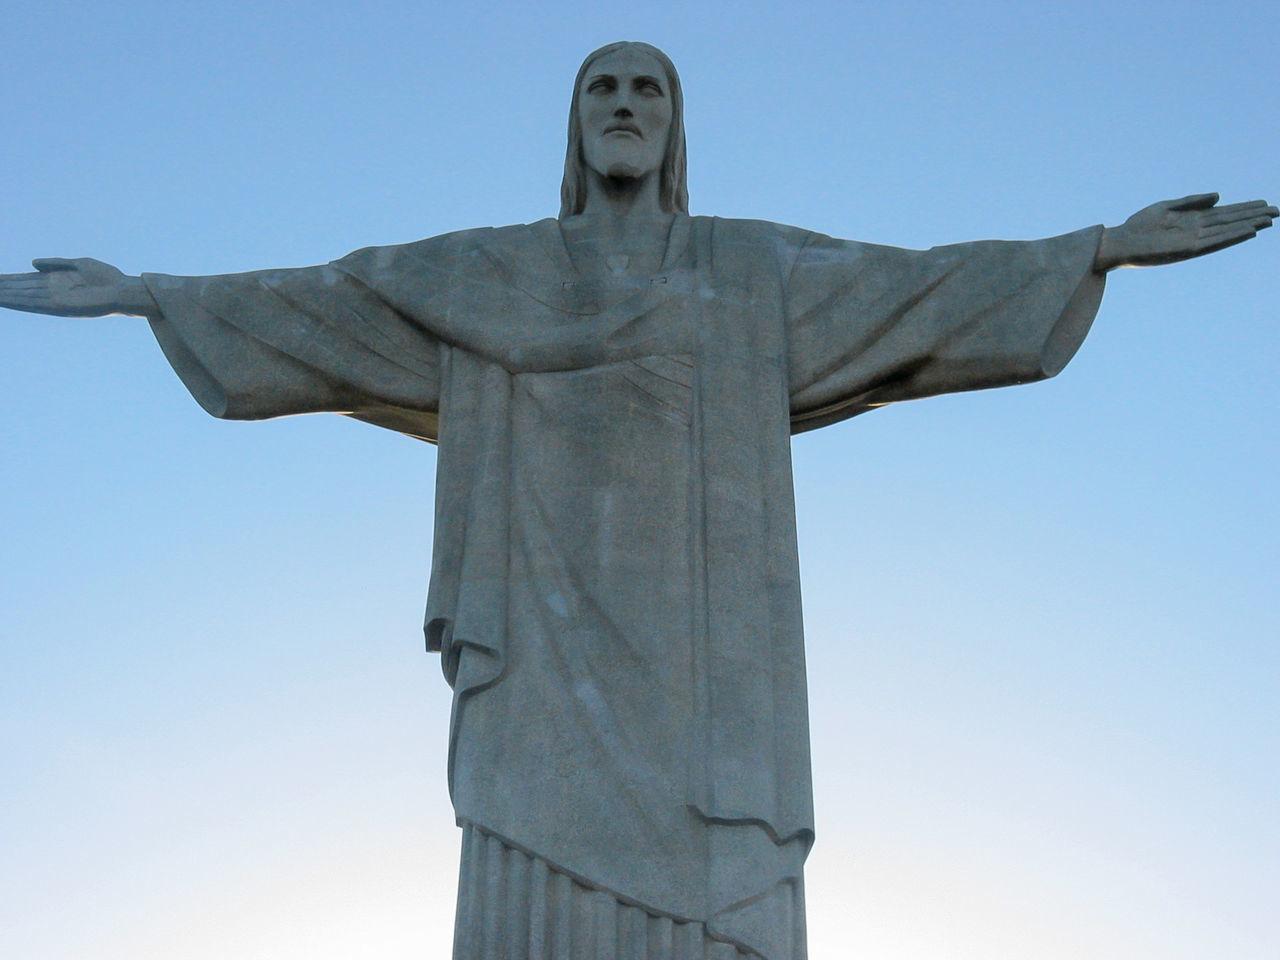 Brasil Brazil Christ The Redeemer Christianity Corcovado Cristo Redentor Famous Famous Place Icon Jesus Landmark Monument Mountain Religion Rio Rio De Janeiro Sculpture Sky South America Statue Status Tourism Travel